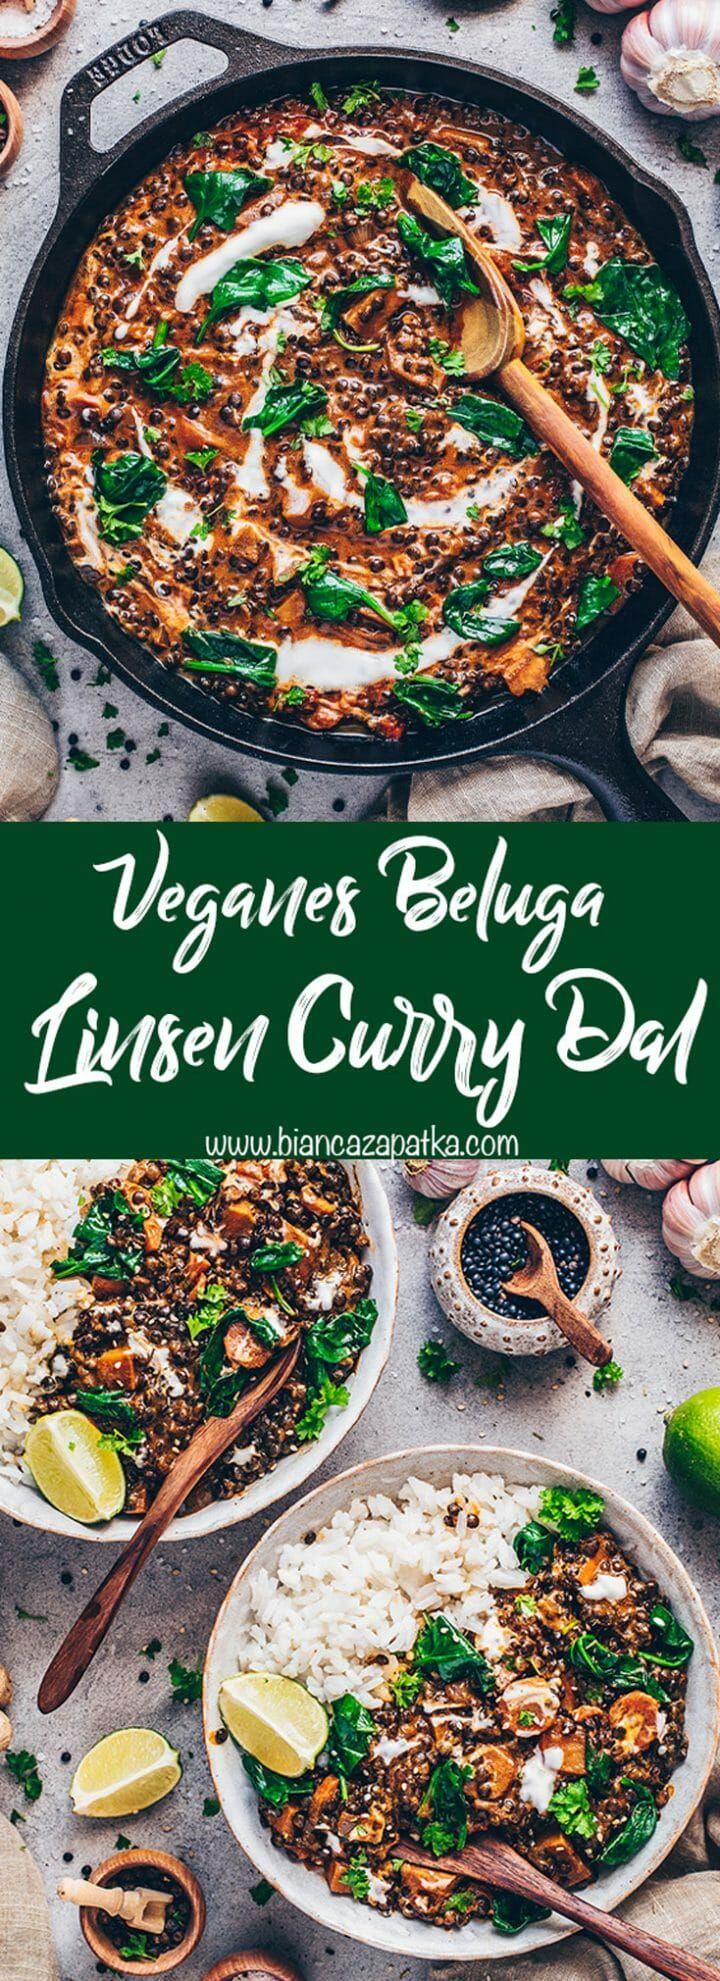 Beluga Linsen Curry | Indisches Dal Makhani (Vegan) - Bianca Zapatka | Rezepte